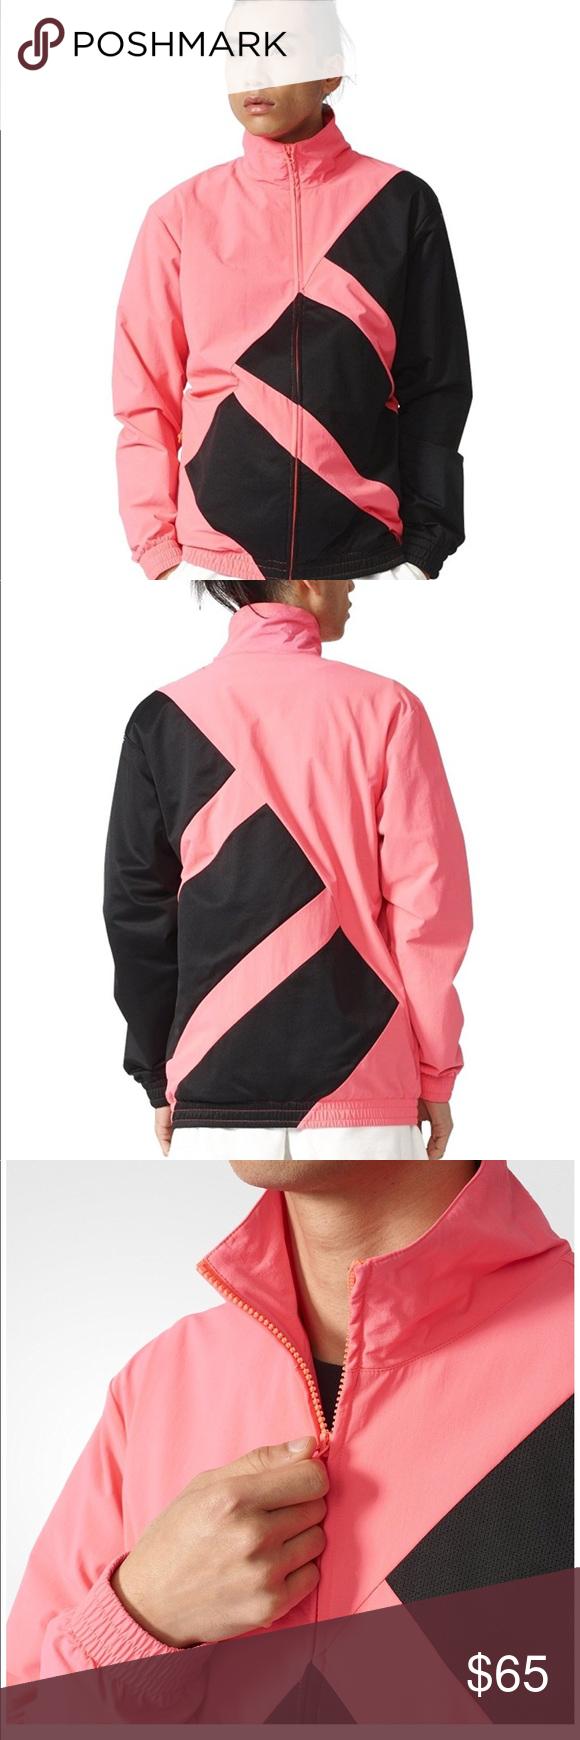 6e791415f27c NWT EQT Superstar Bold Track Jacket ADIDAS  100 S Brand new w  tags size  small